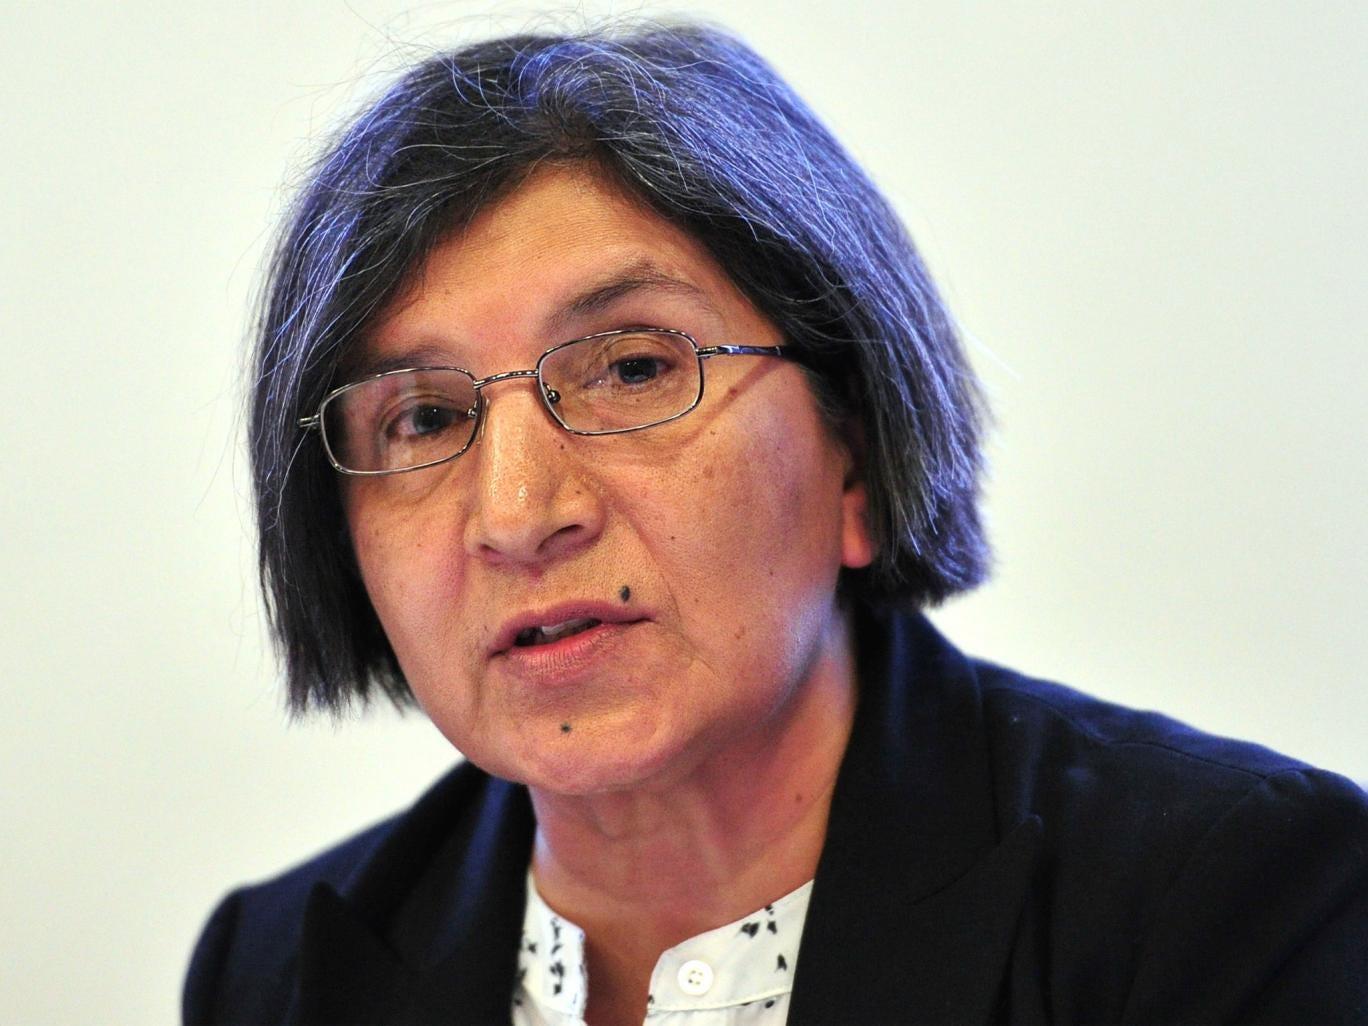 United Nations special rapporteur Rashida Manjoo addresses journalists in central London